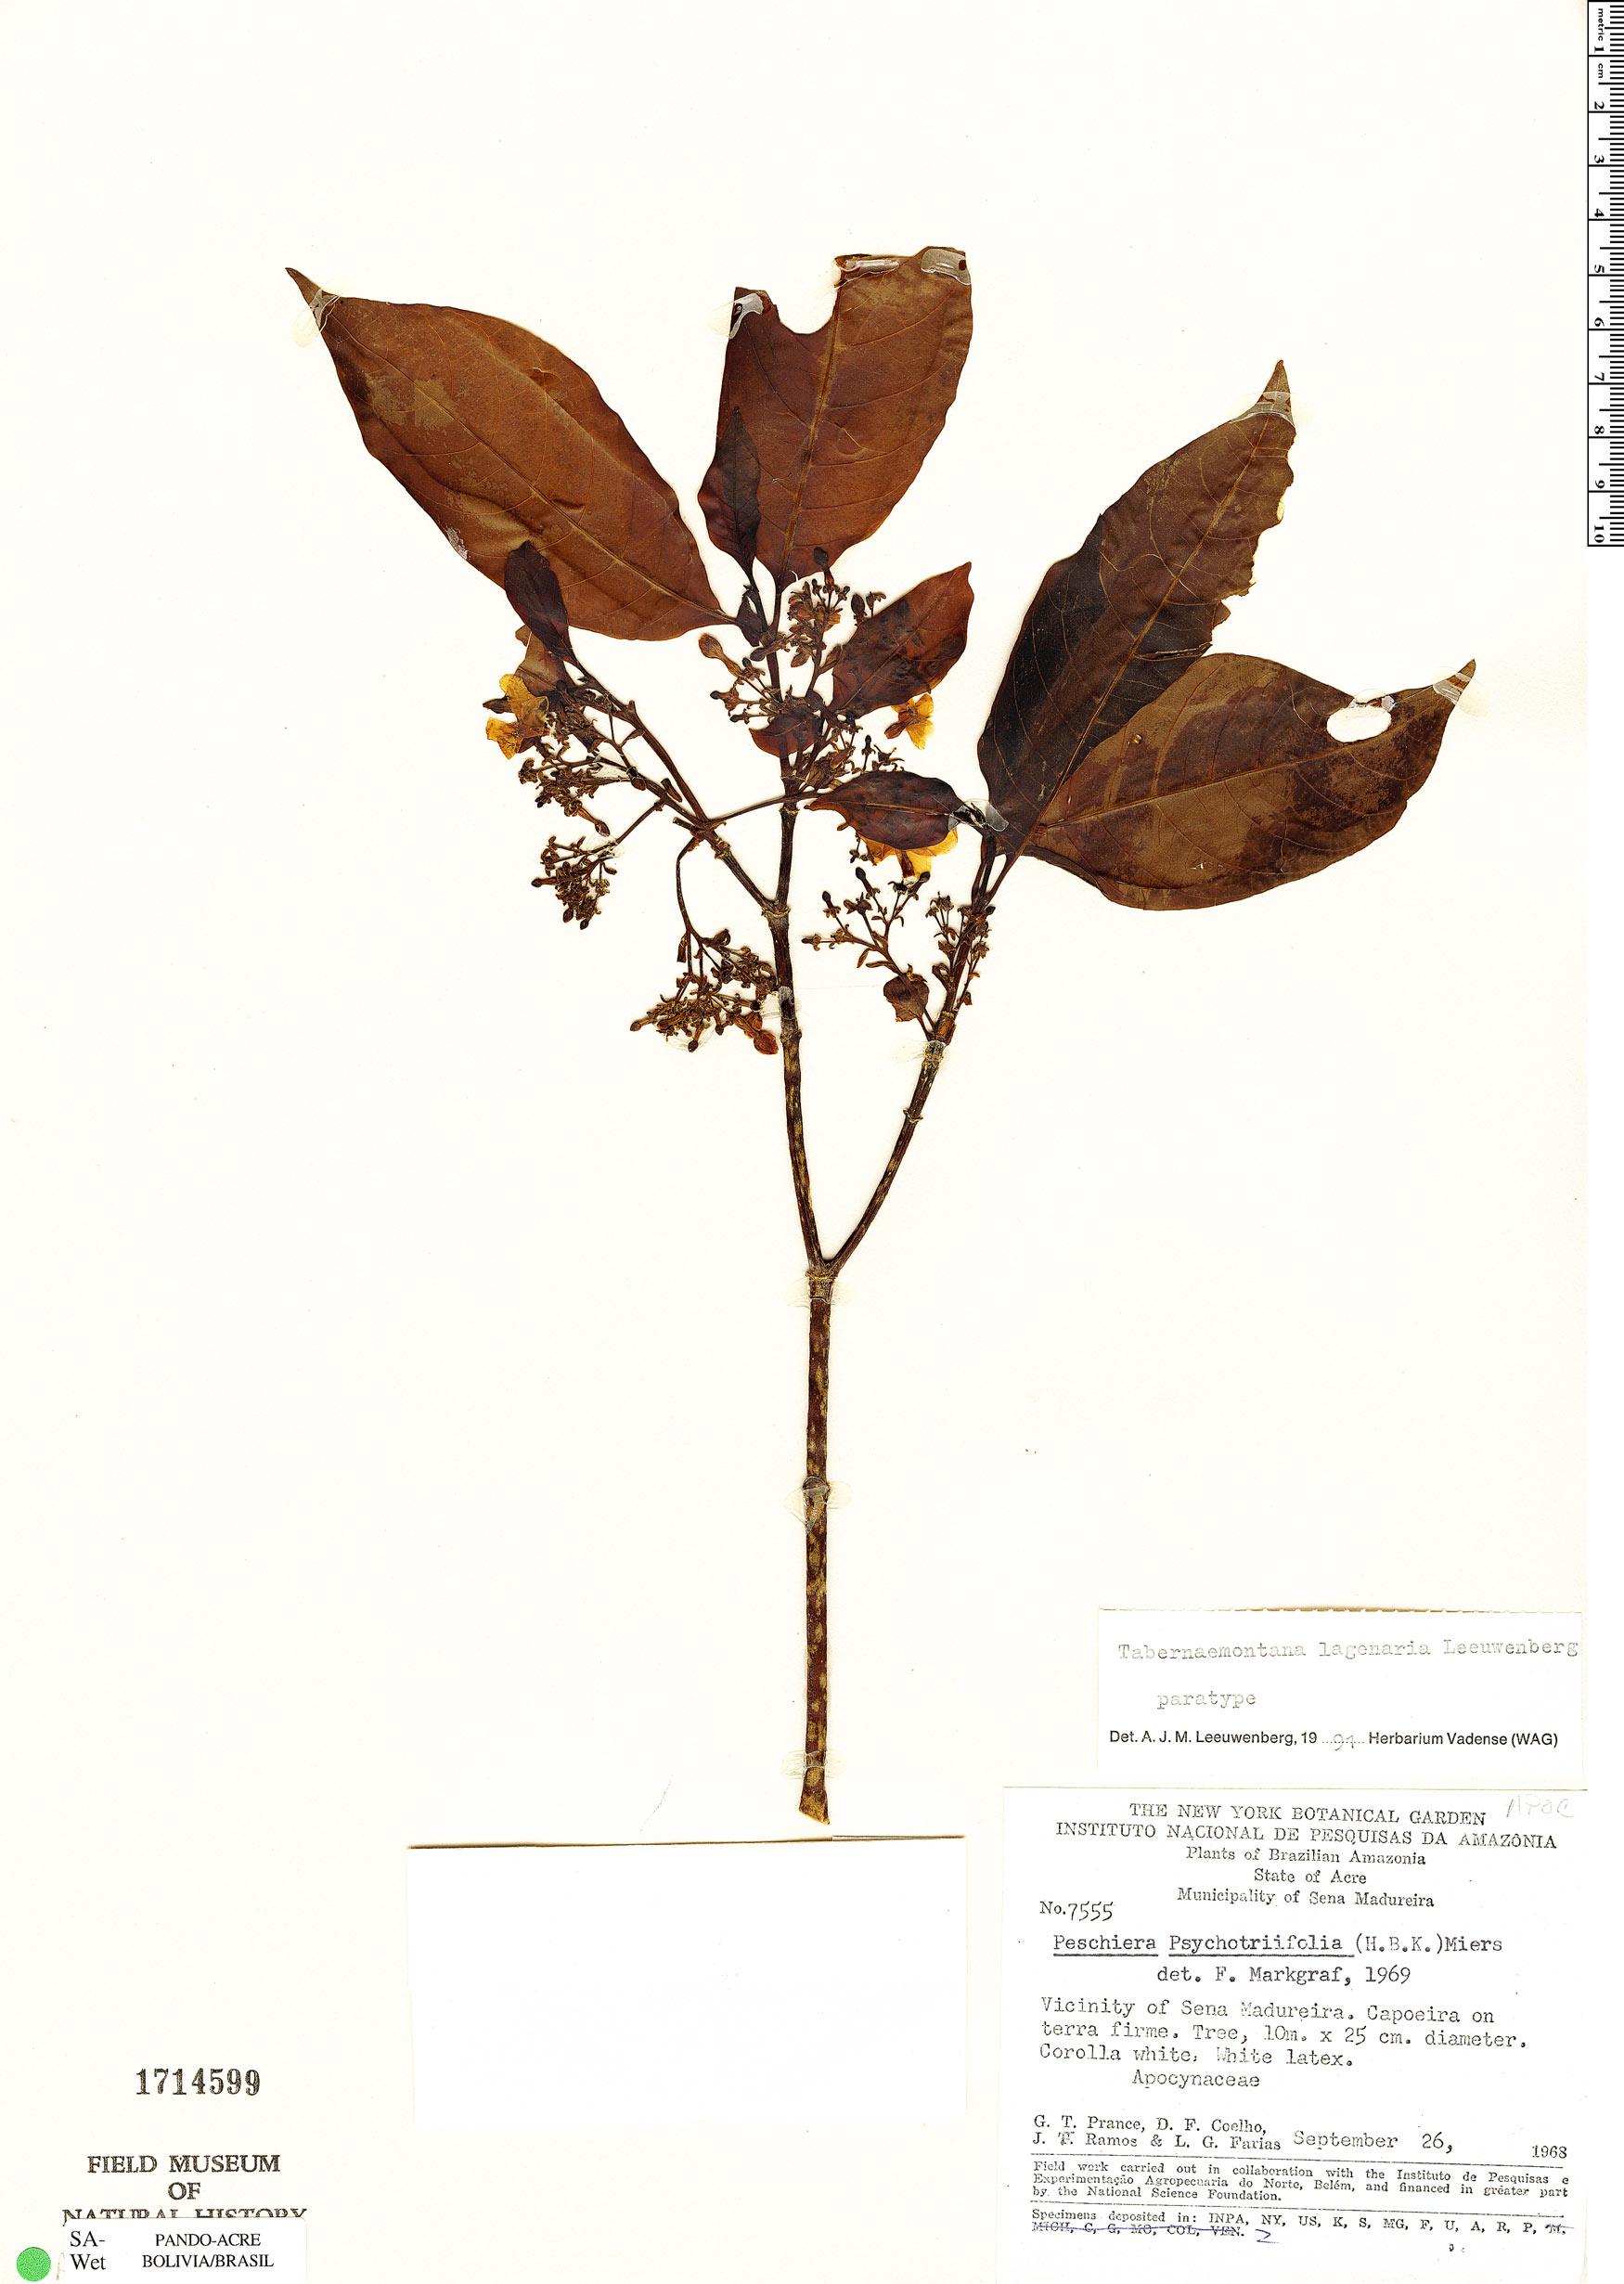 Specimen: Tabernaemontana lagenaria